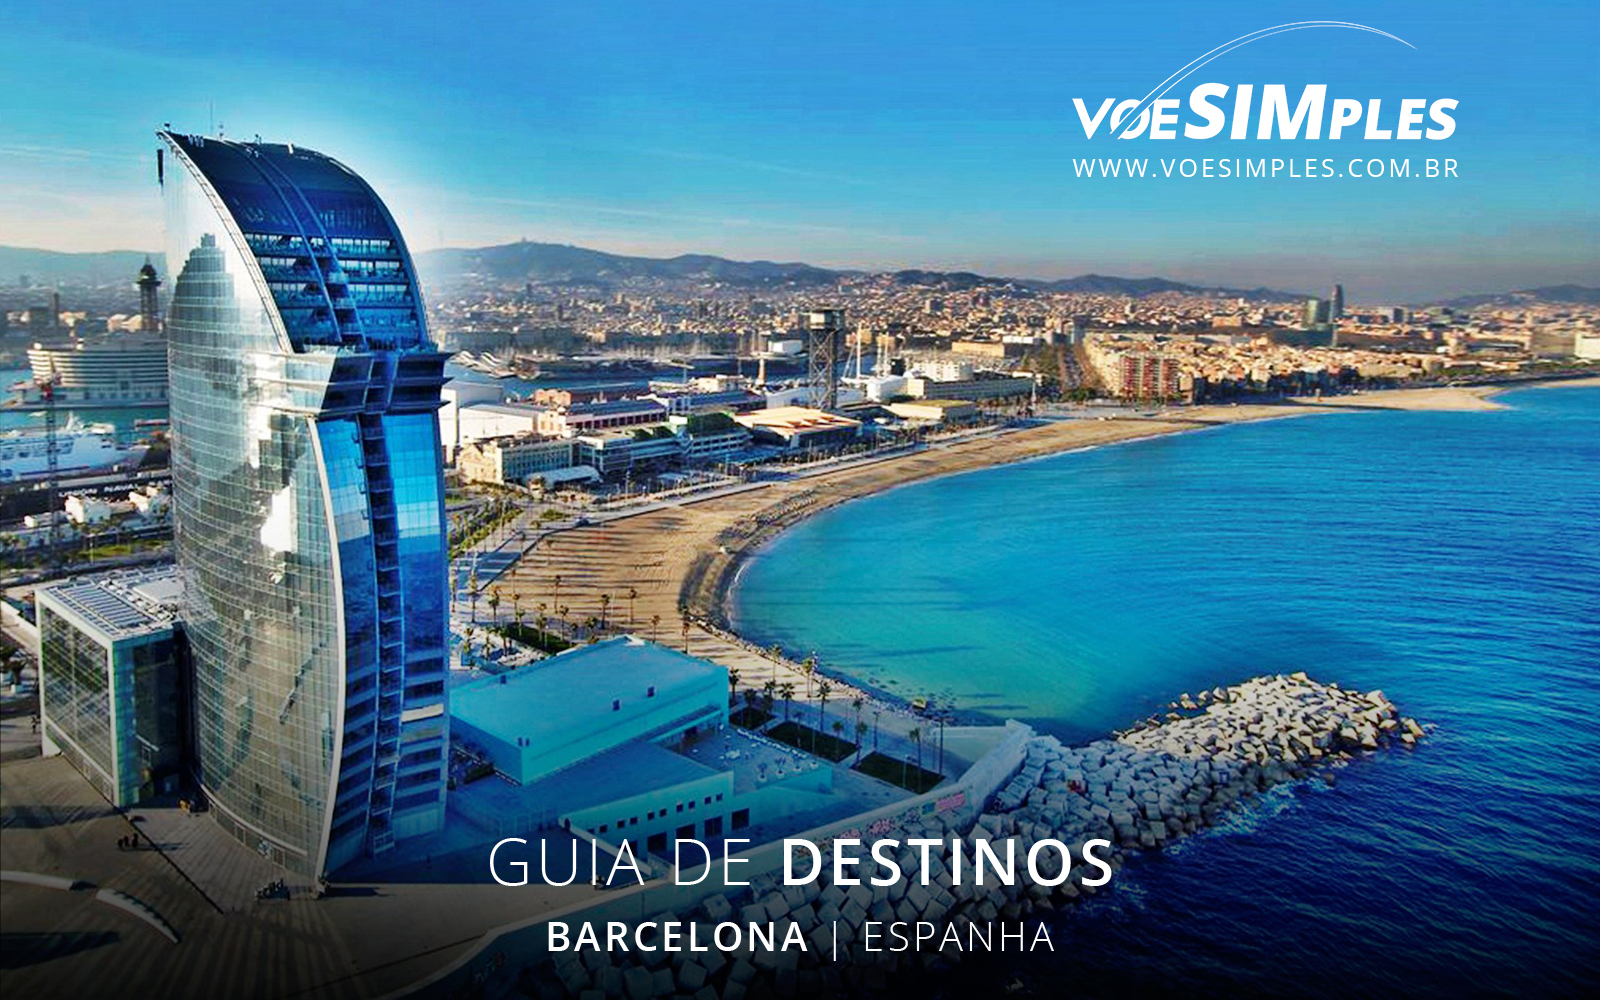 fotos-guia-destinos-voe-simples-barcelona-espanha-guia-viagens-voesimples-barcelona-espanha-pontos-turisticos-barcelona-espanha-fotos-barcelona-04@2x